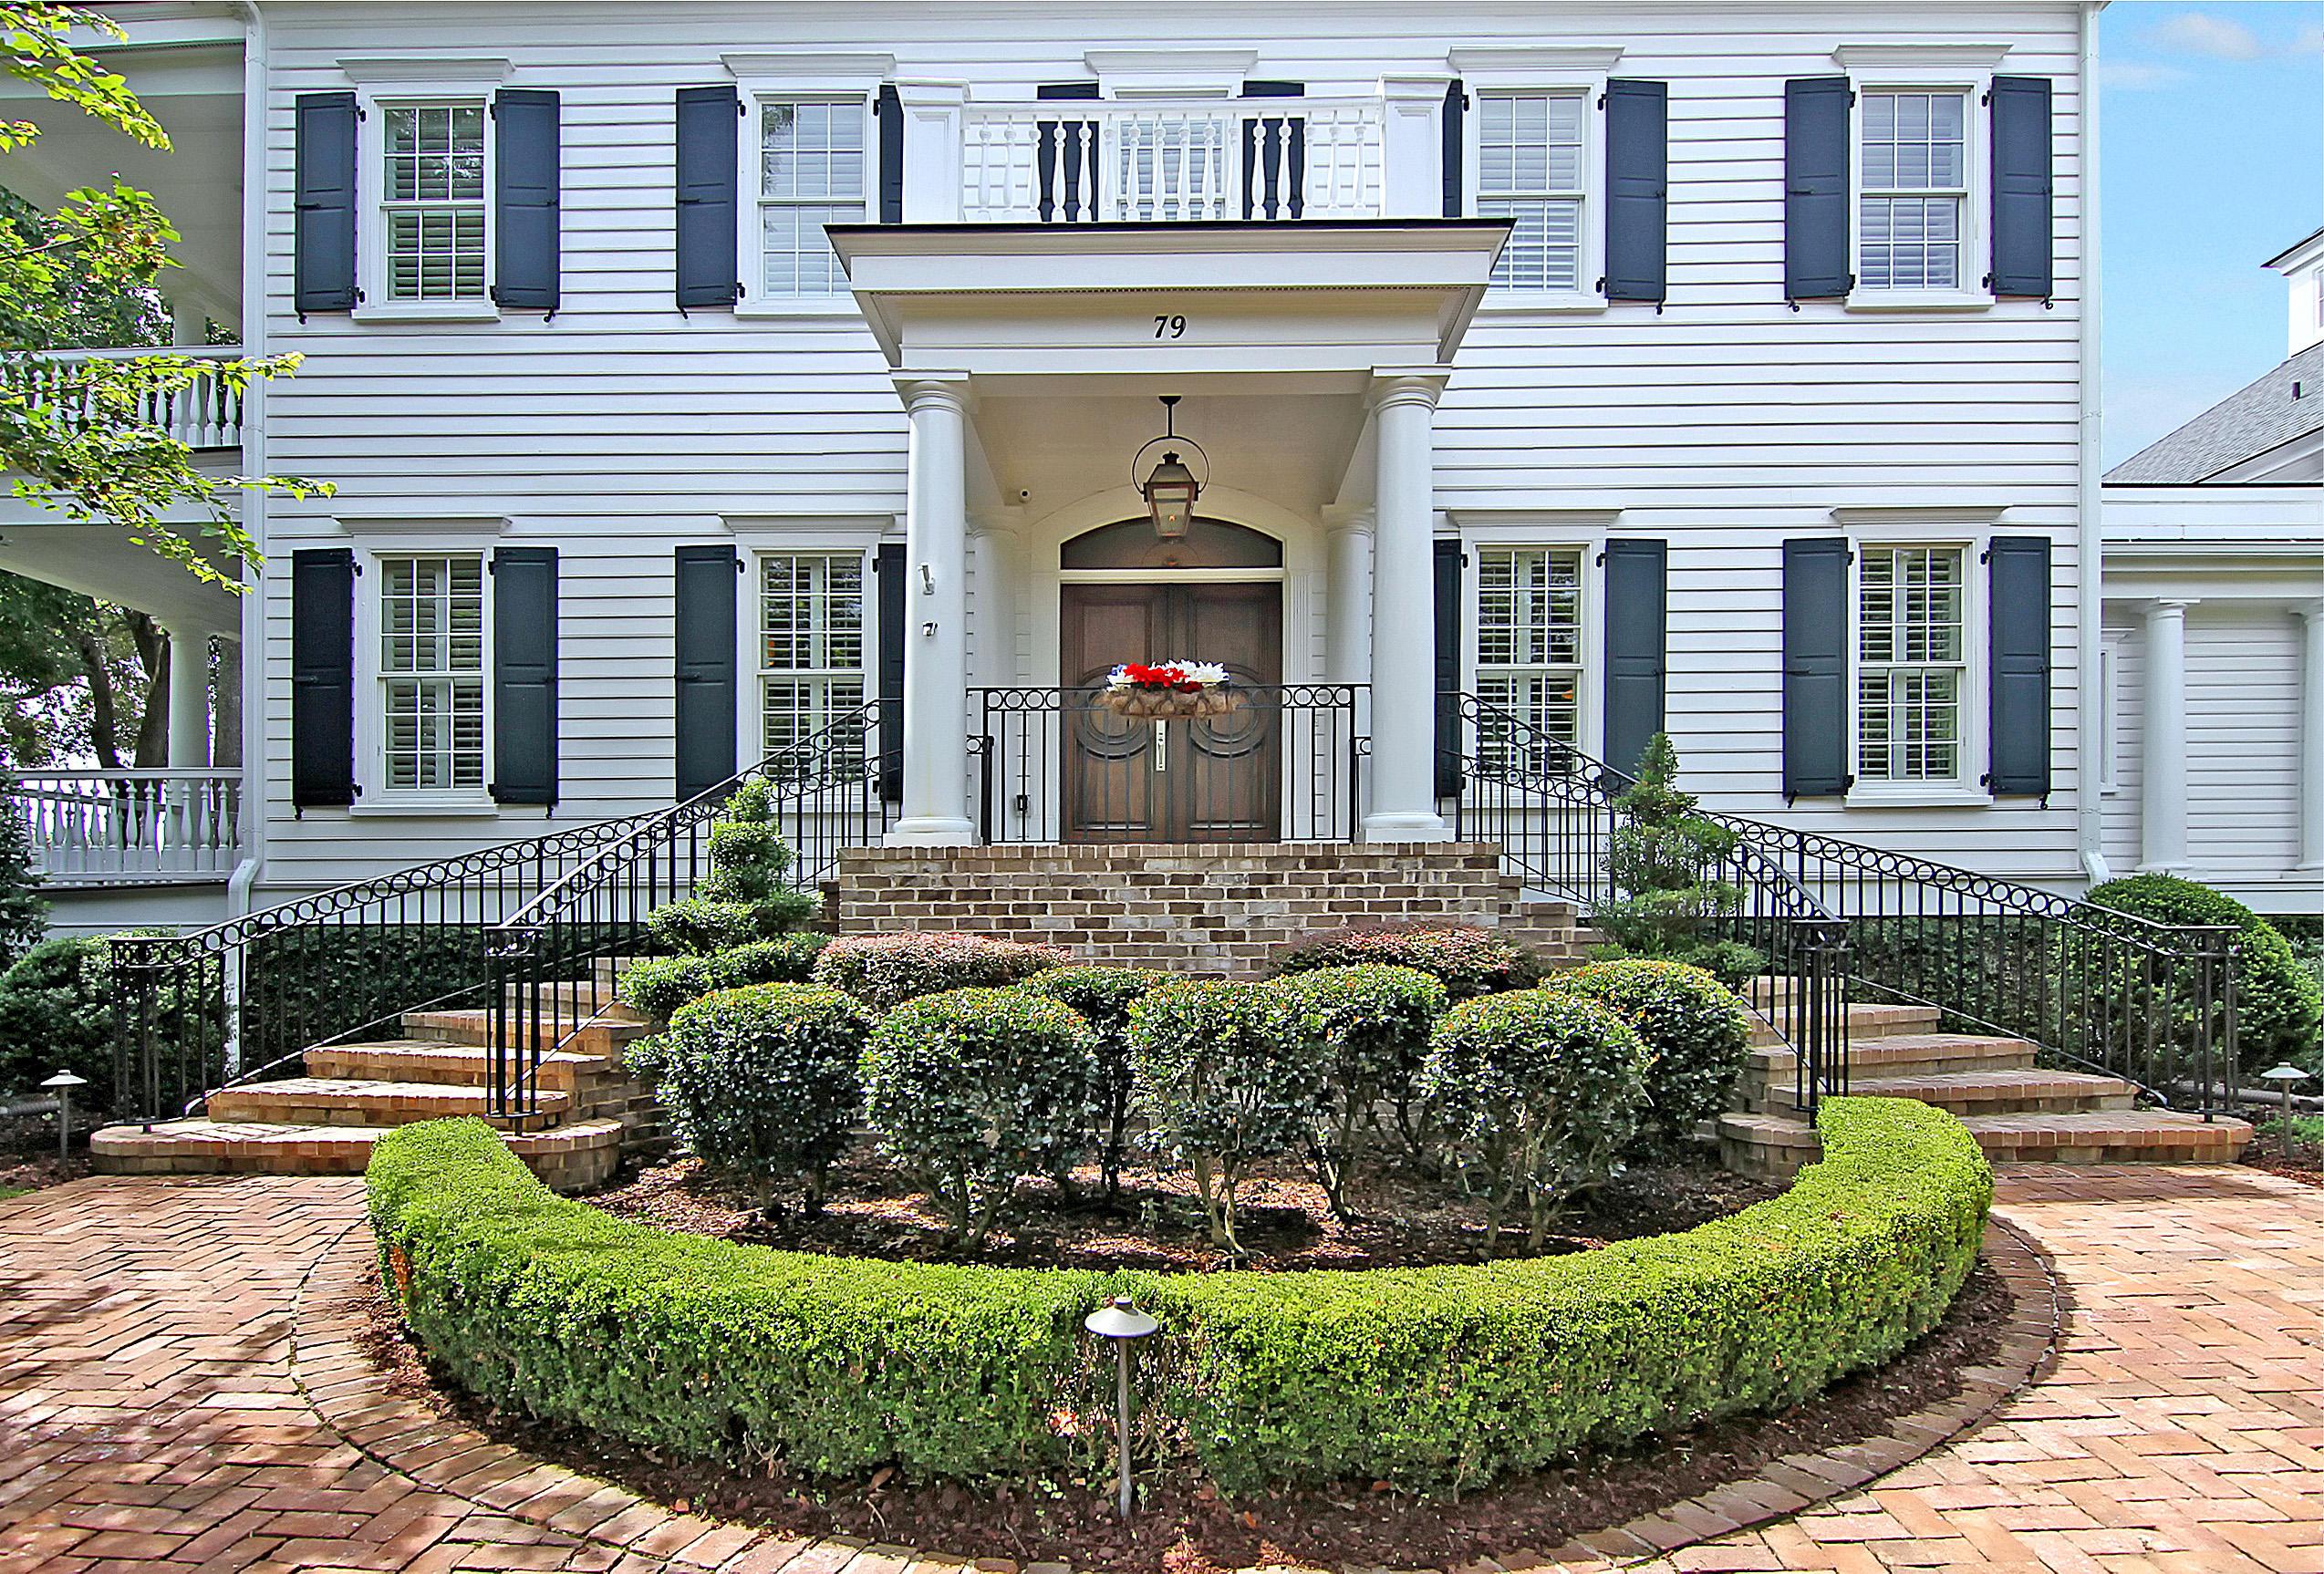 Daniel Island Homes For Sale - 79 Dalton, Charleston, SC - 44